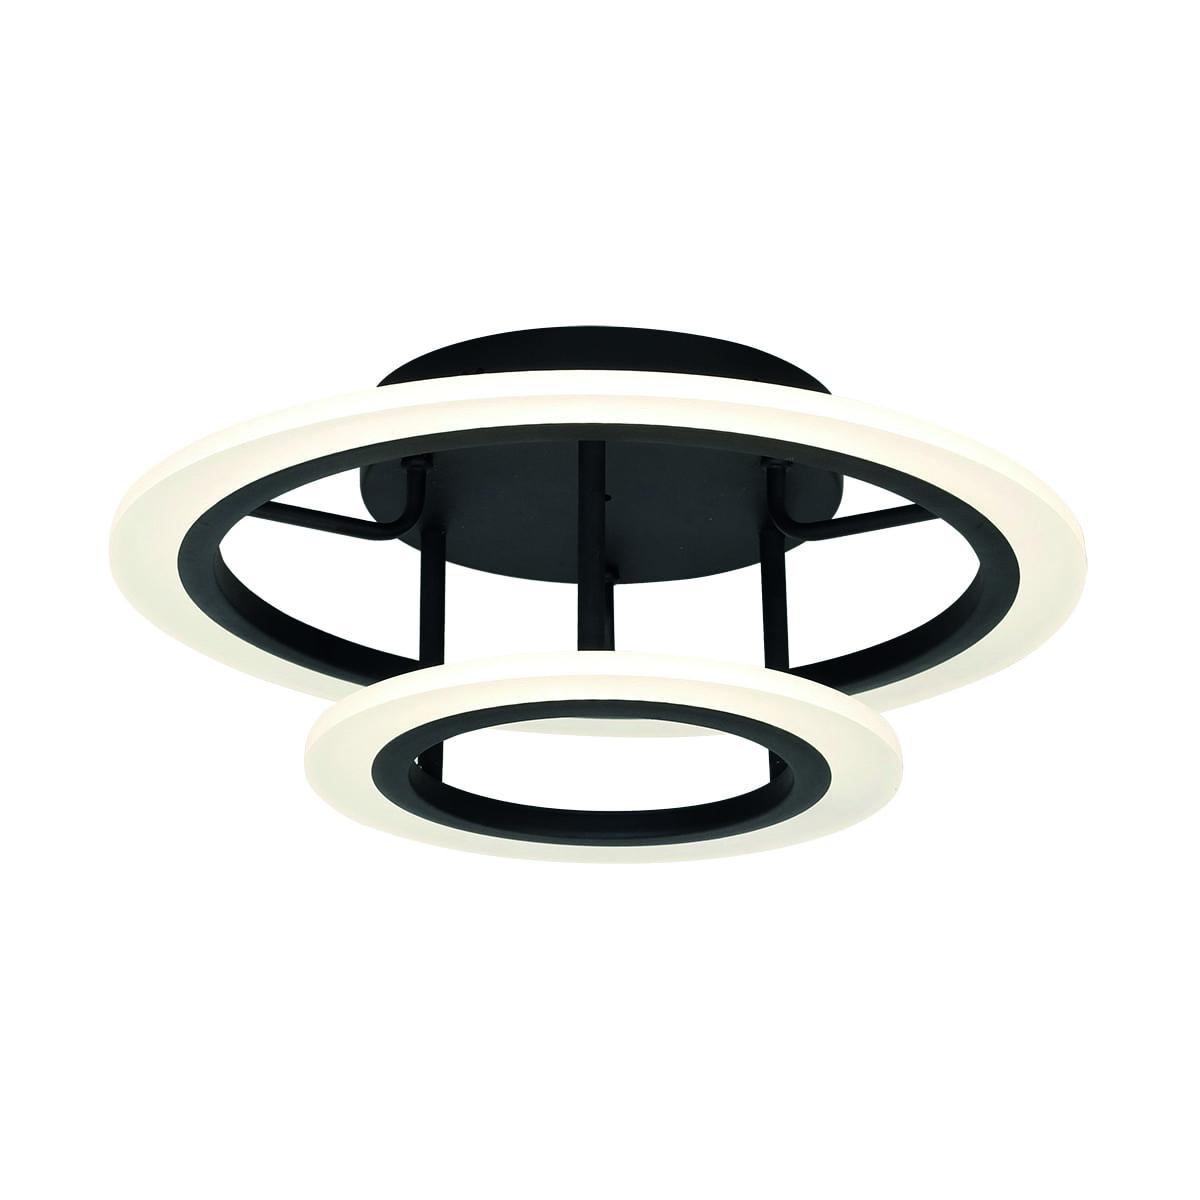 Lampa suspendată Milagro COSMO 167 Negru nisip 36W